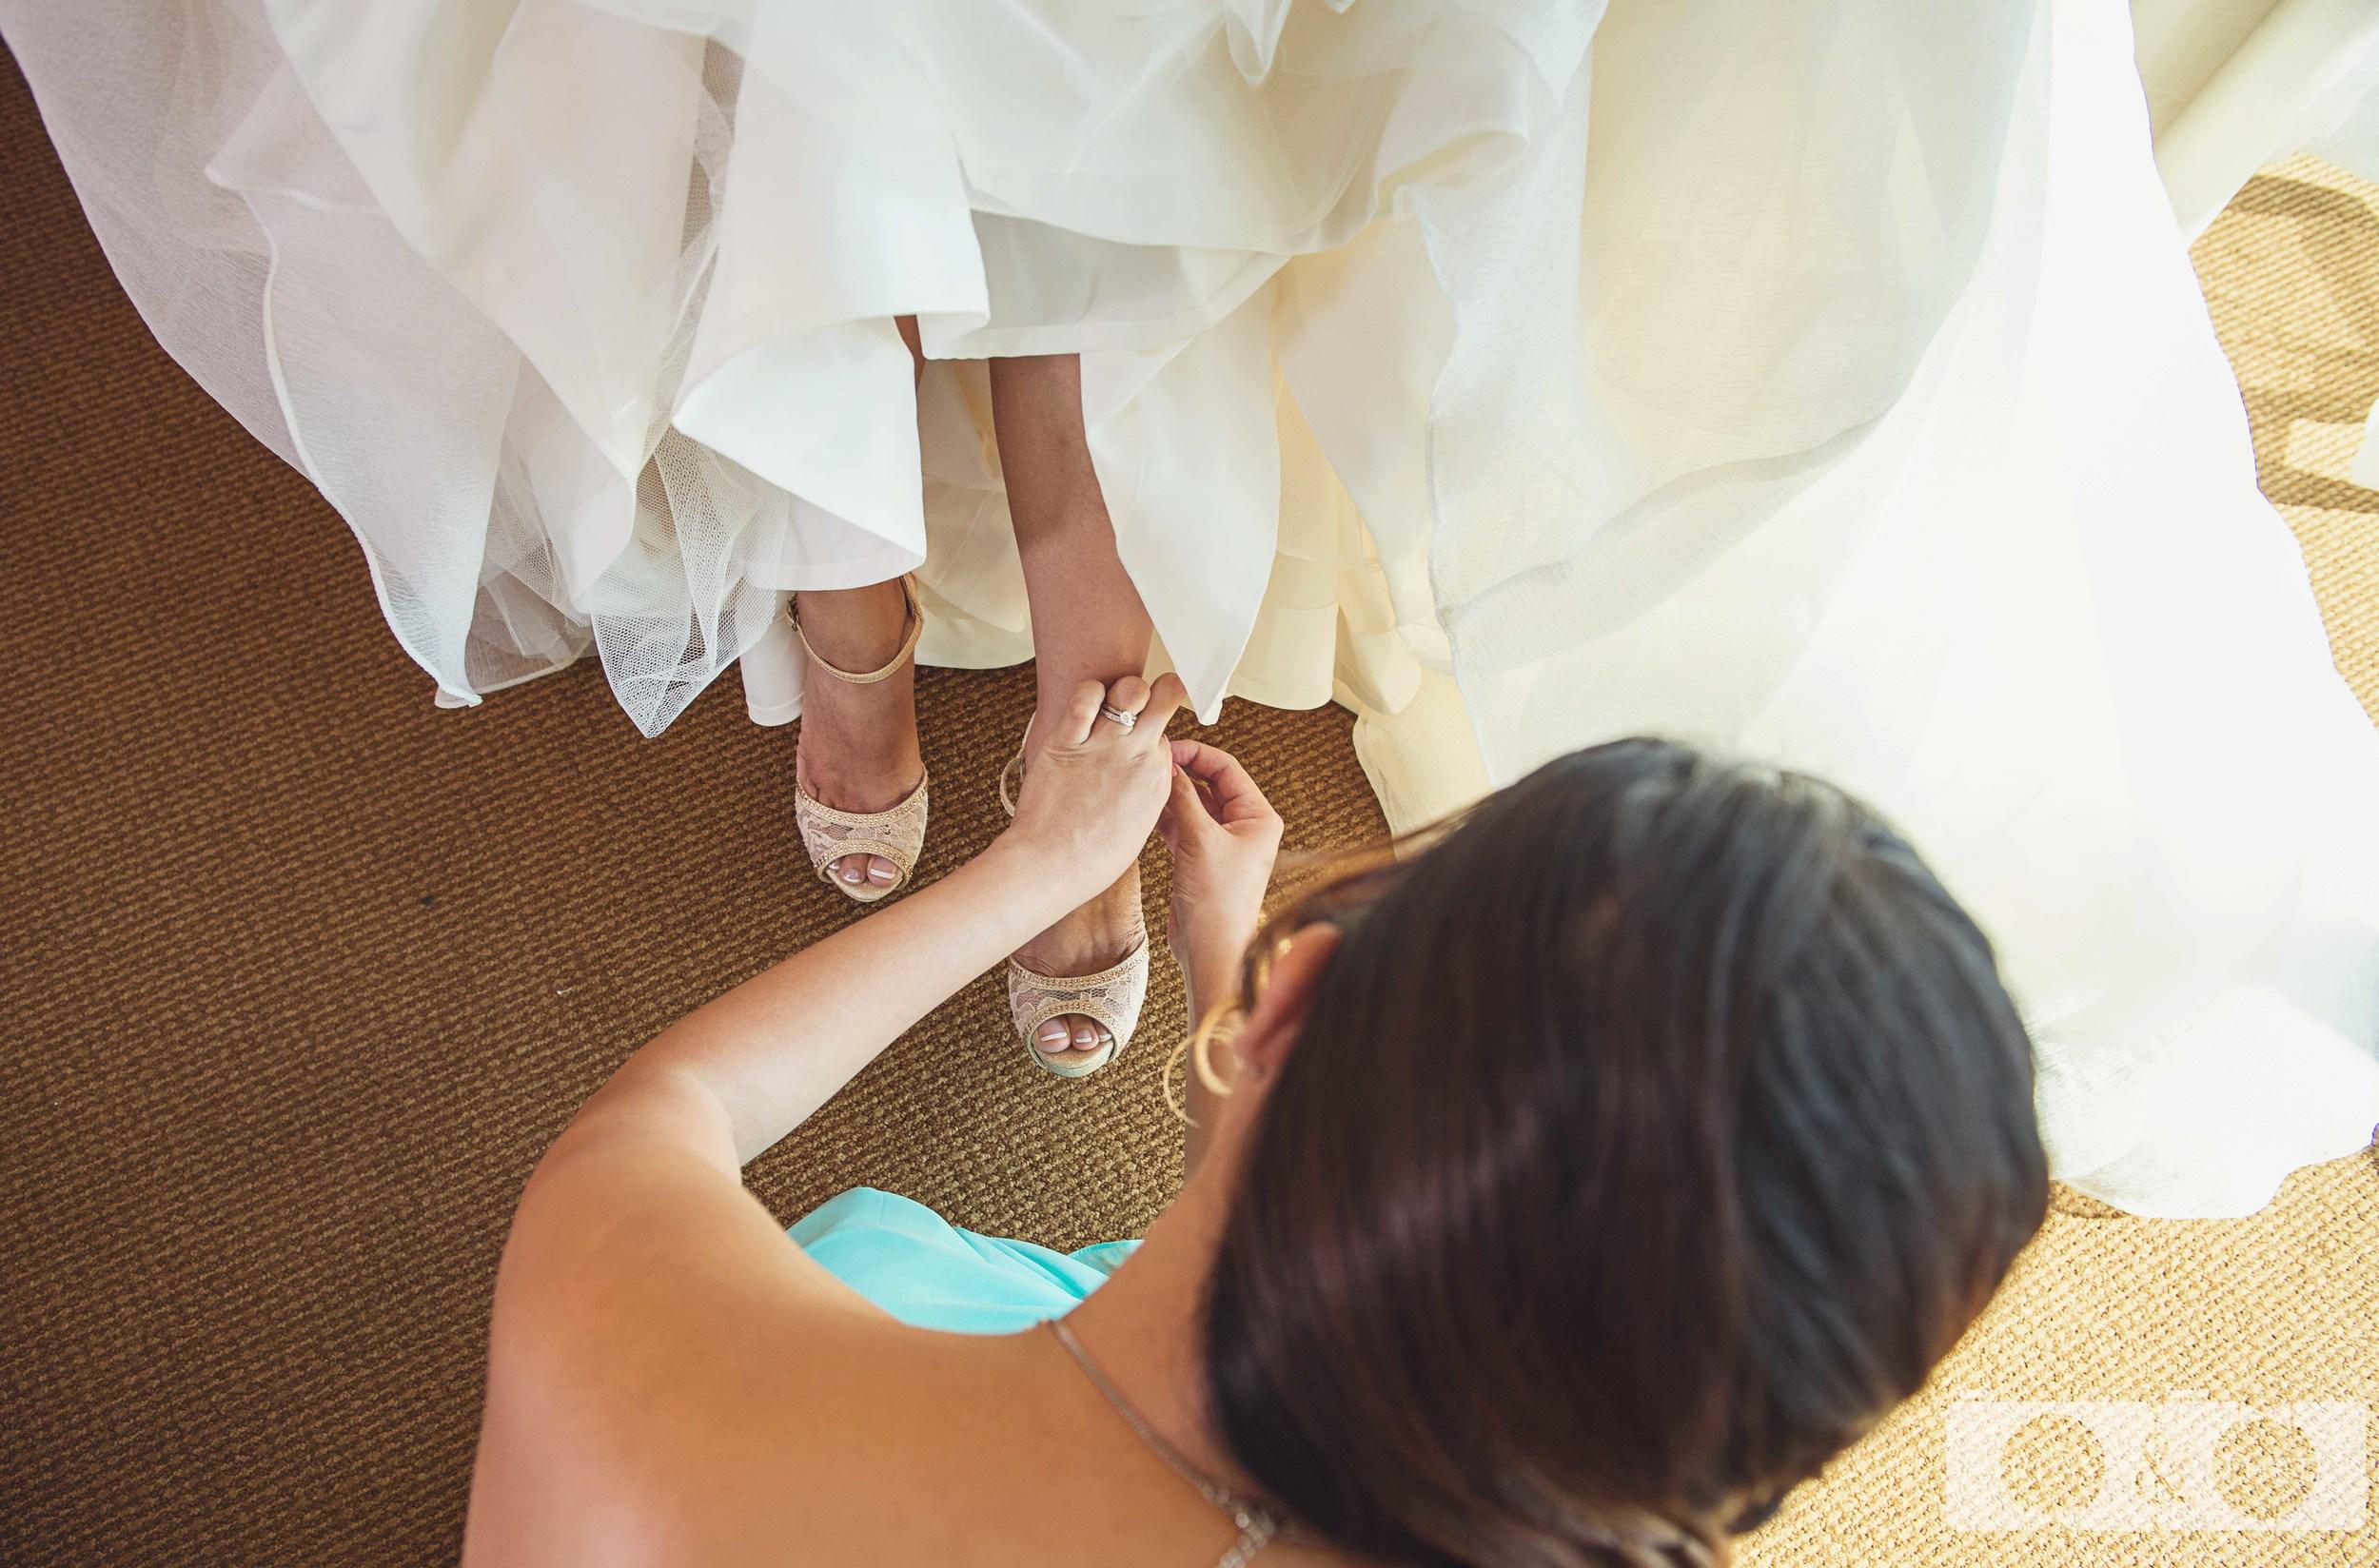 royal-palace-banquet-hall-glendale-wedding-25.JPG